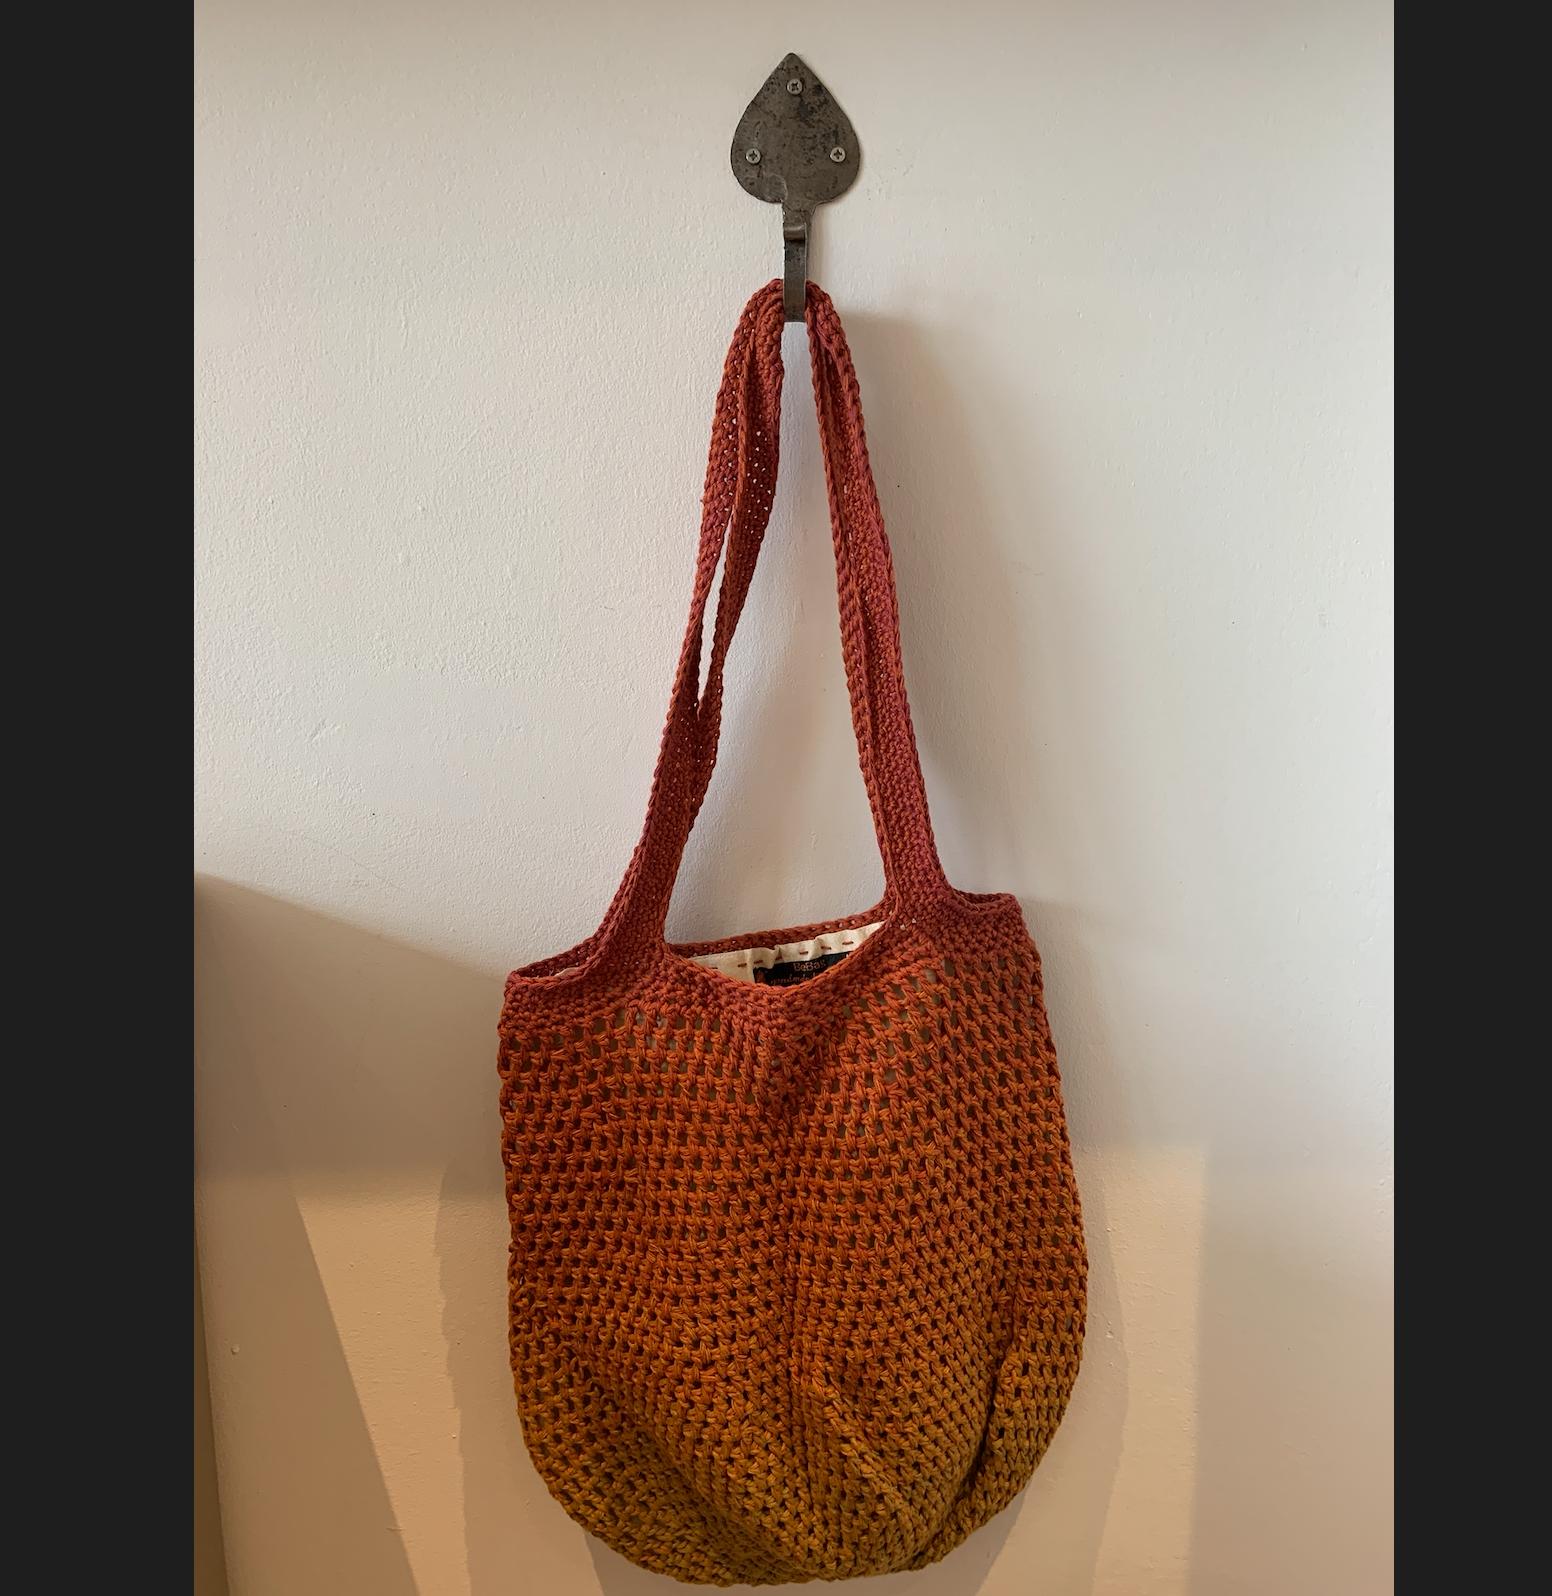 Hand Crochet Cotton Bags